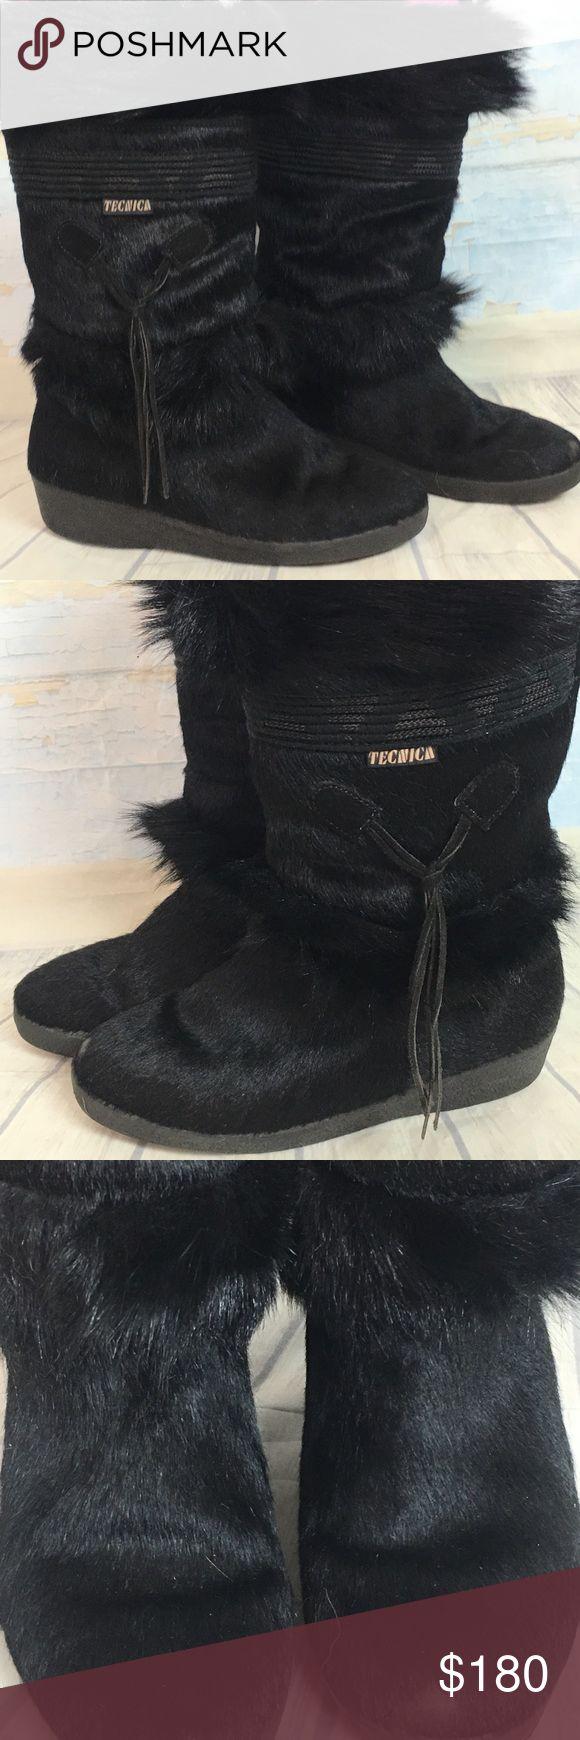 Técnica goat fur black ski snow boots 40 9 9.5 Black técnica goat fur after ski boots, warm shearling lined, and excellent condition. Size 40 will fit 9 9.5. Tecnica Shoes Winter & Rain Boots